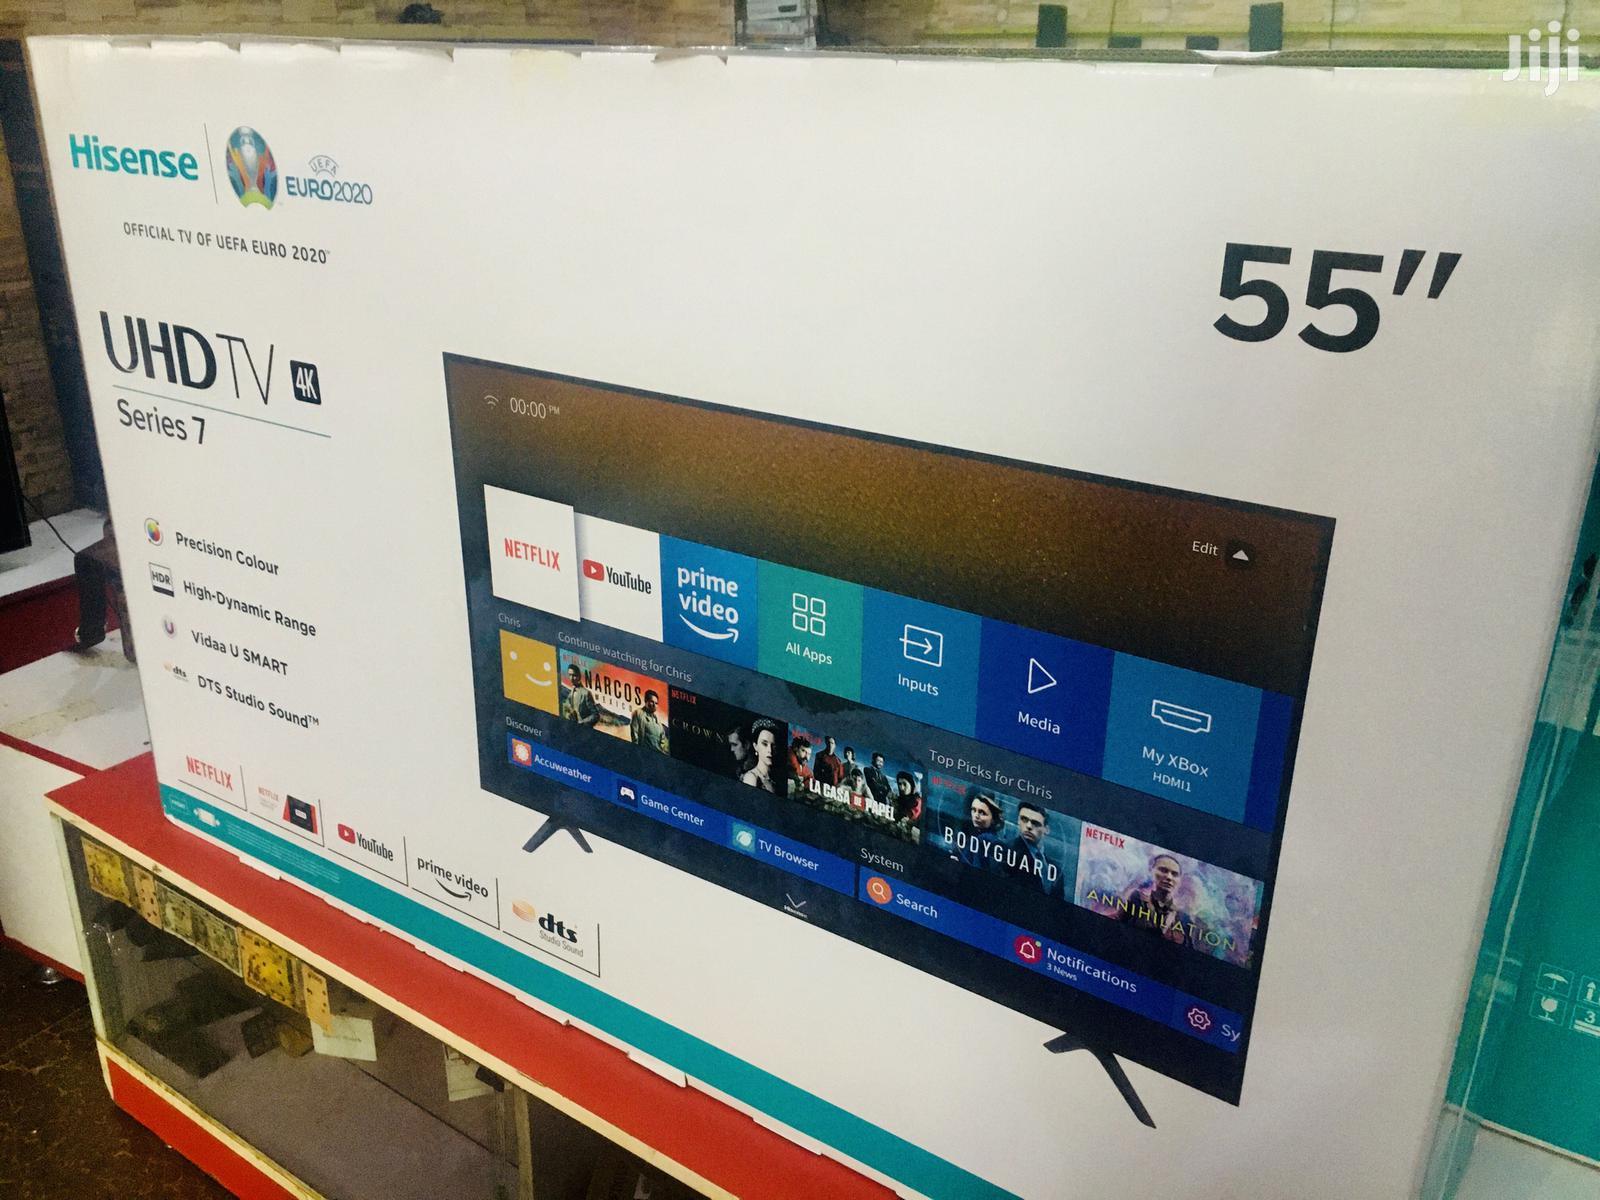 Hisense 55 Inch UHD 4K Smart TV